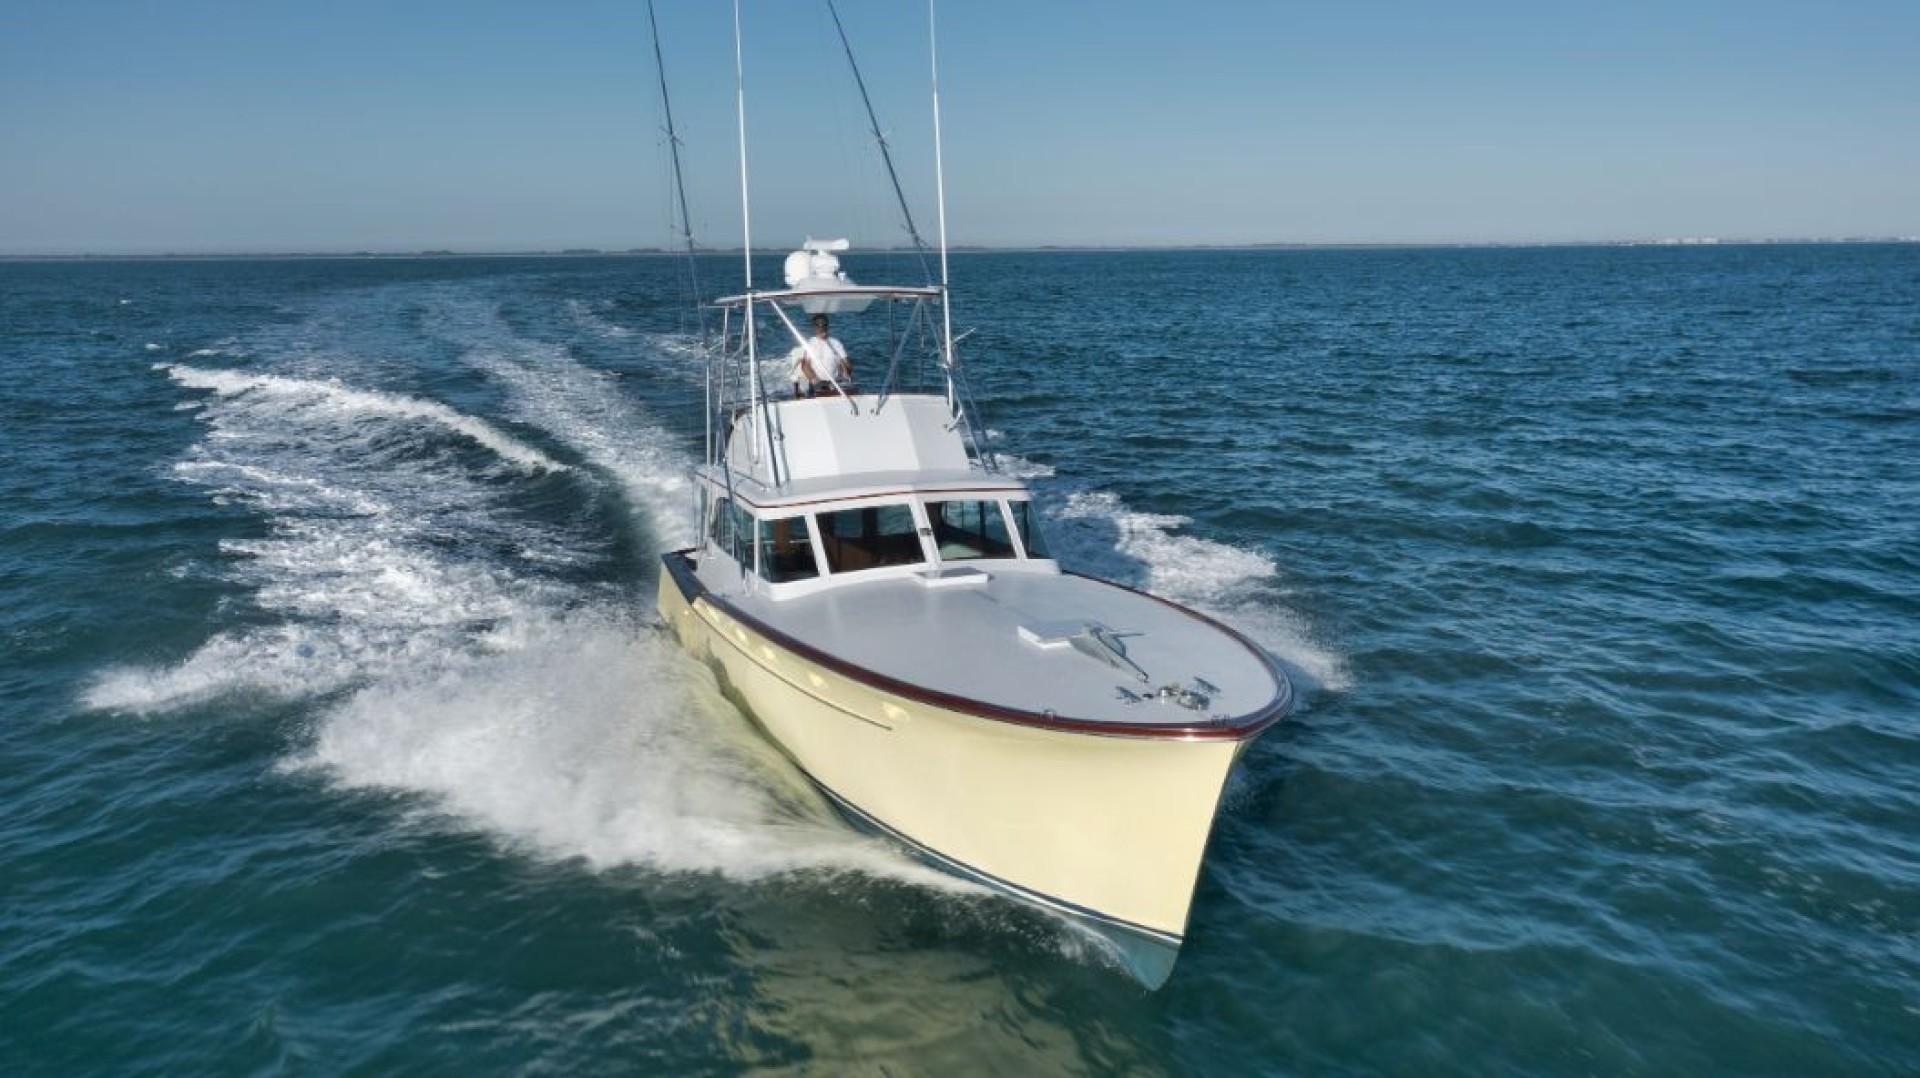 Rybovich 45 - Cygnet - exterior bow